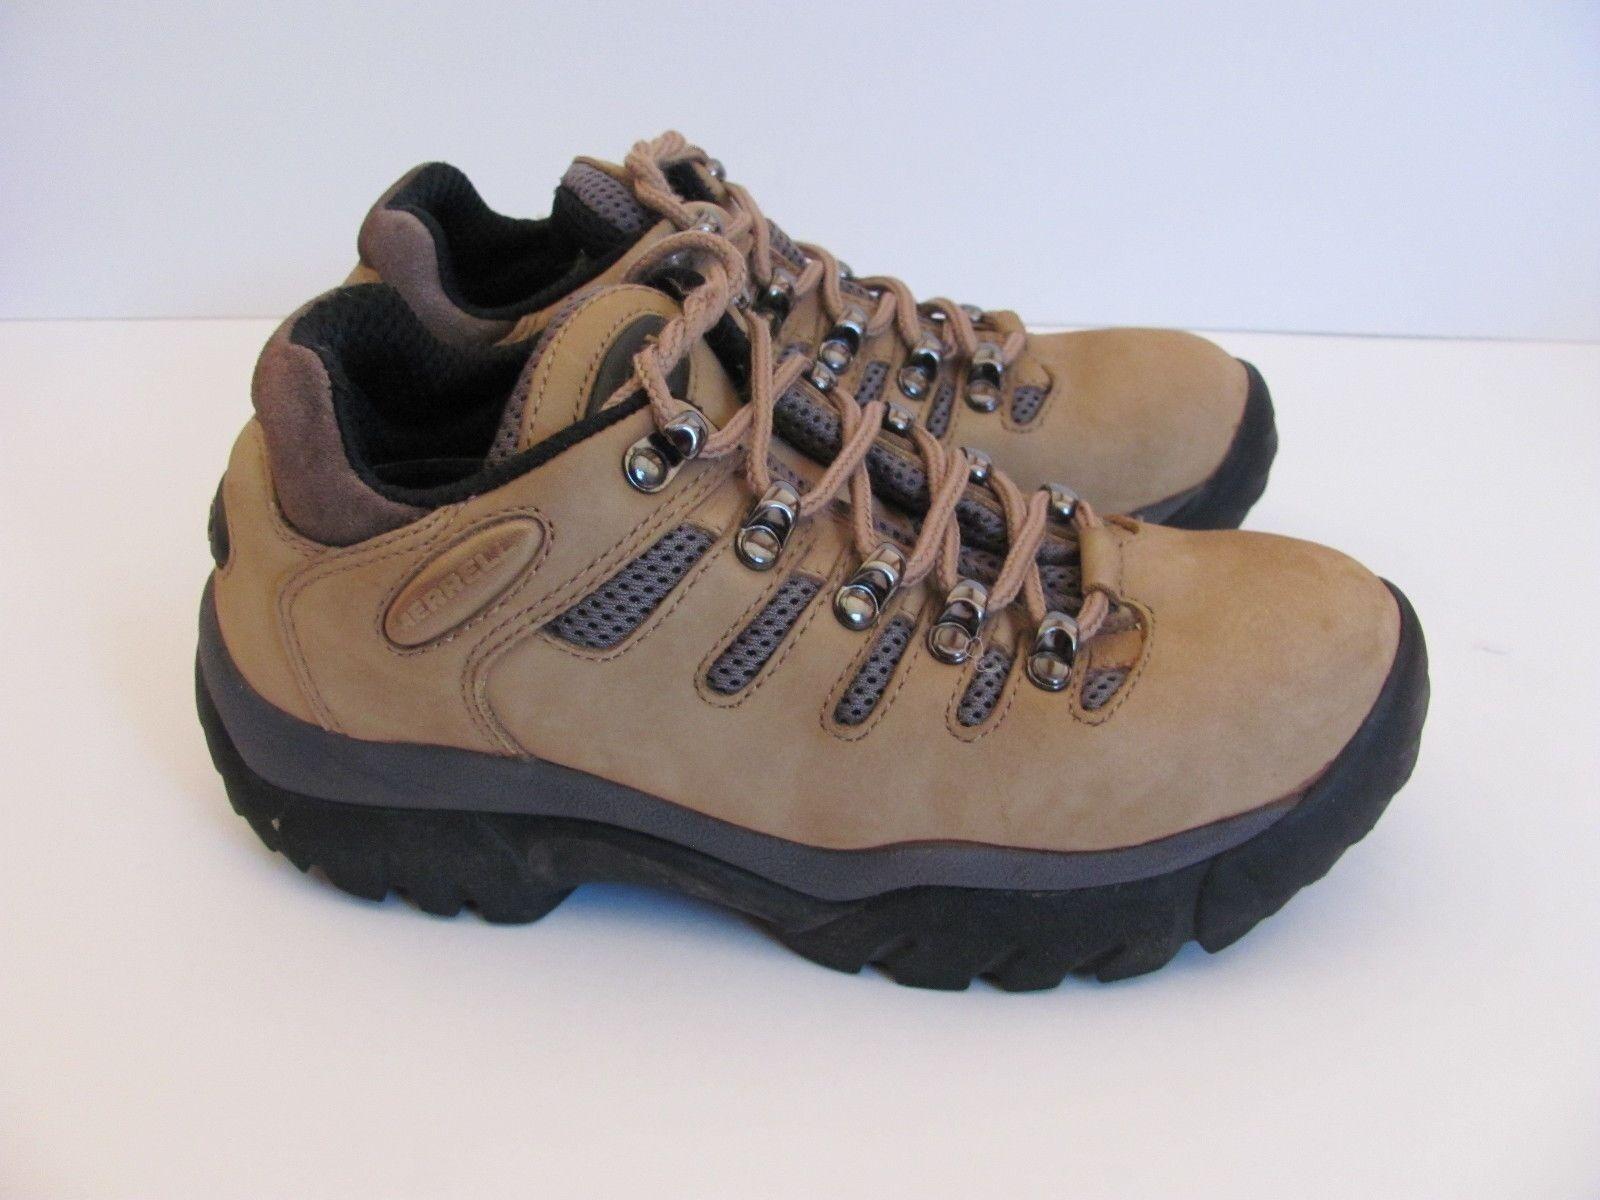 Merrell Women's Sedona Ventilator Low Hiking Trail shoes,  Size US 6